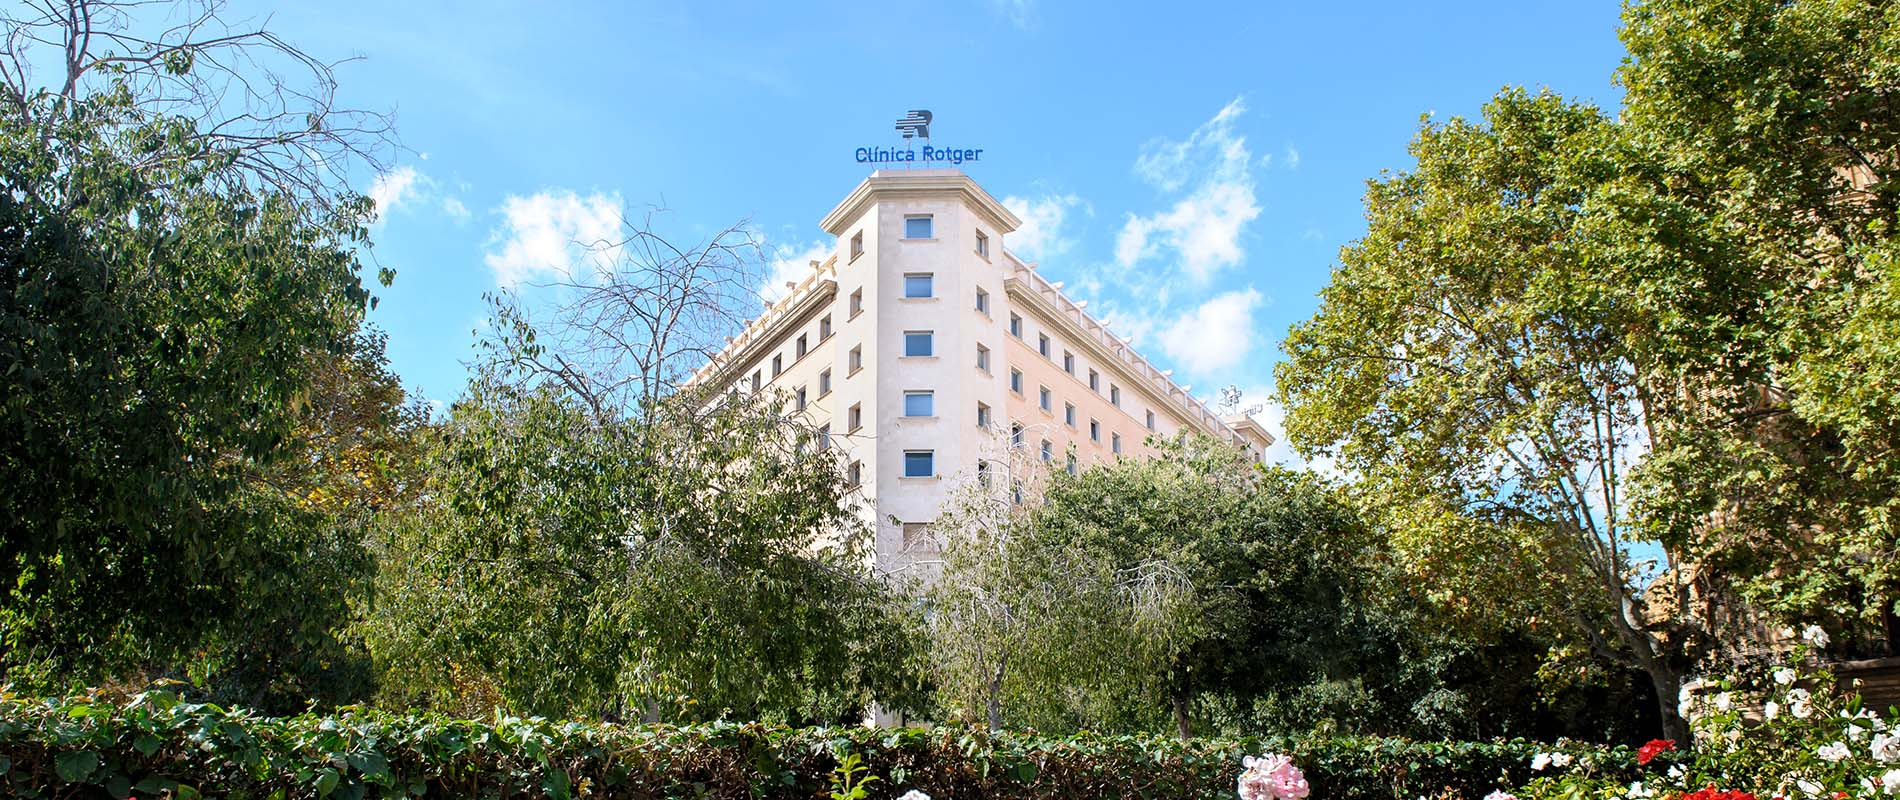 Clínica-Rotger-Quironsalud-Hospital-Mallorca